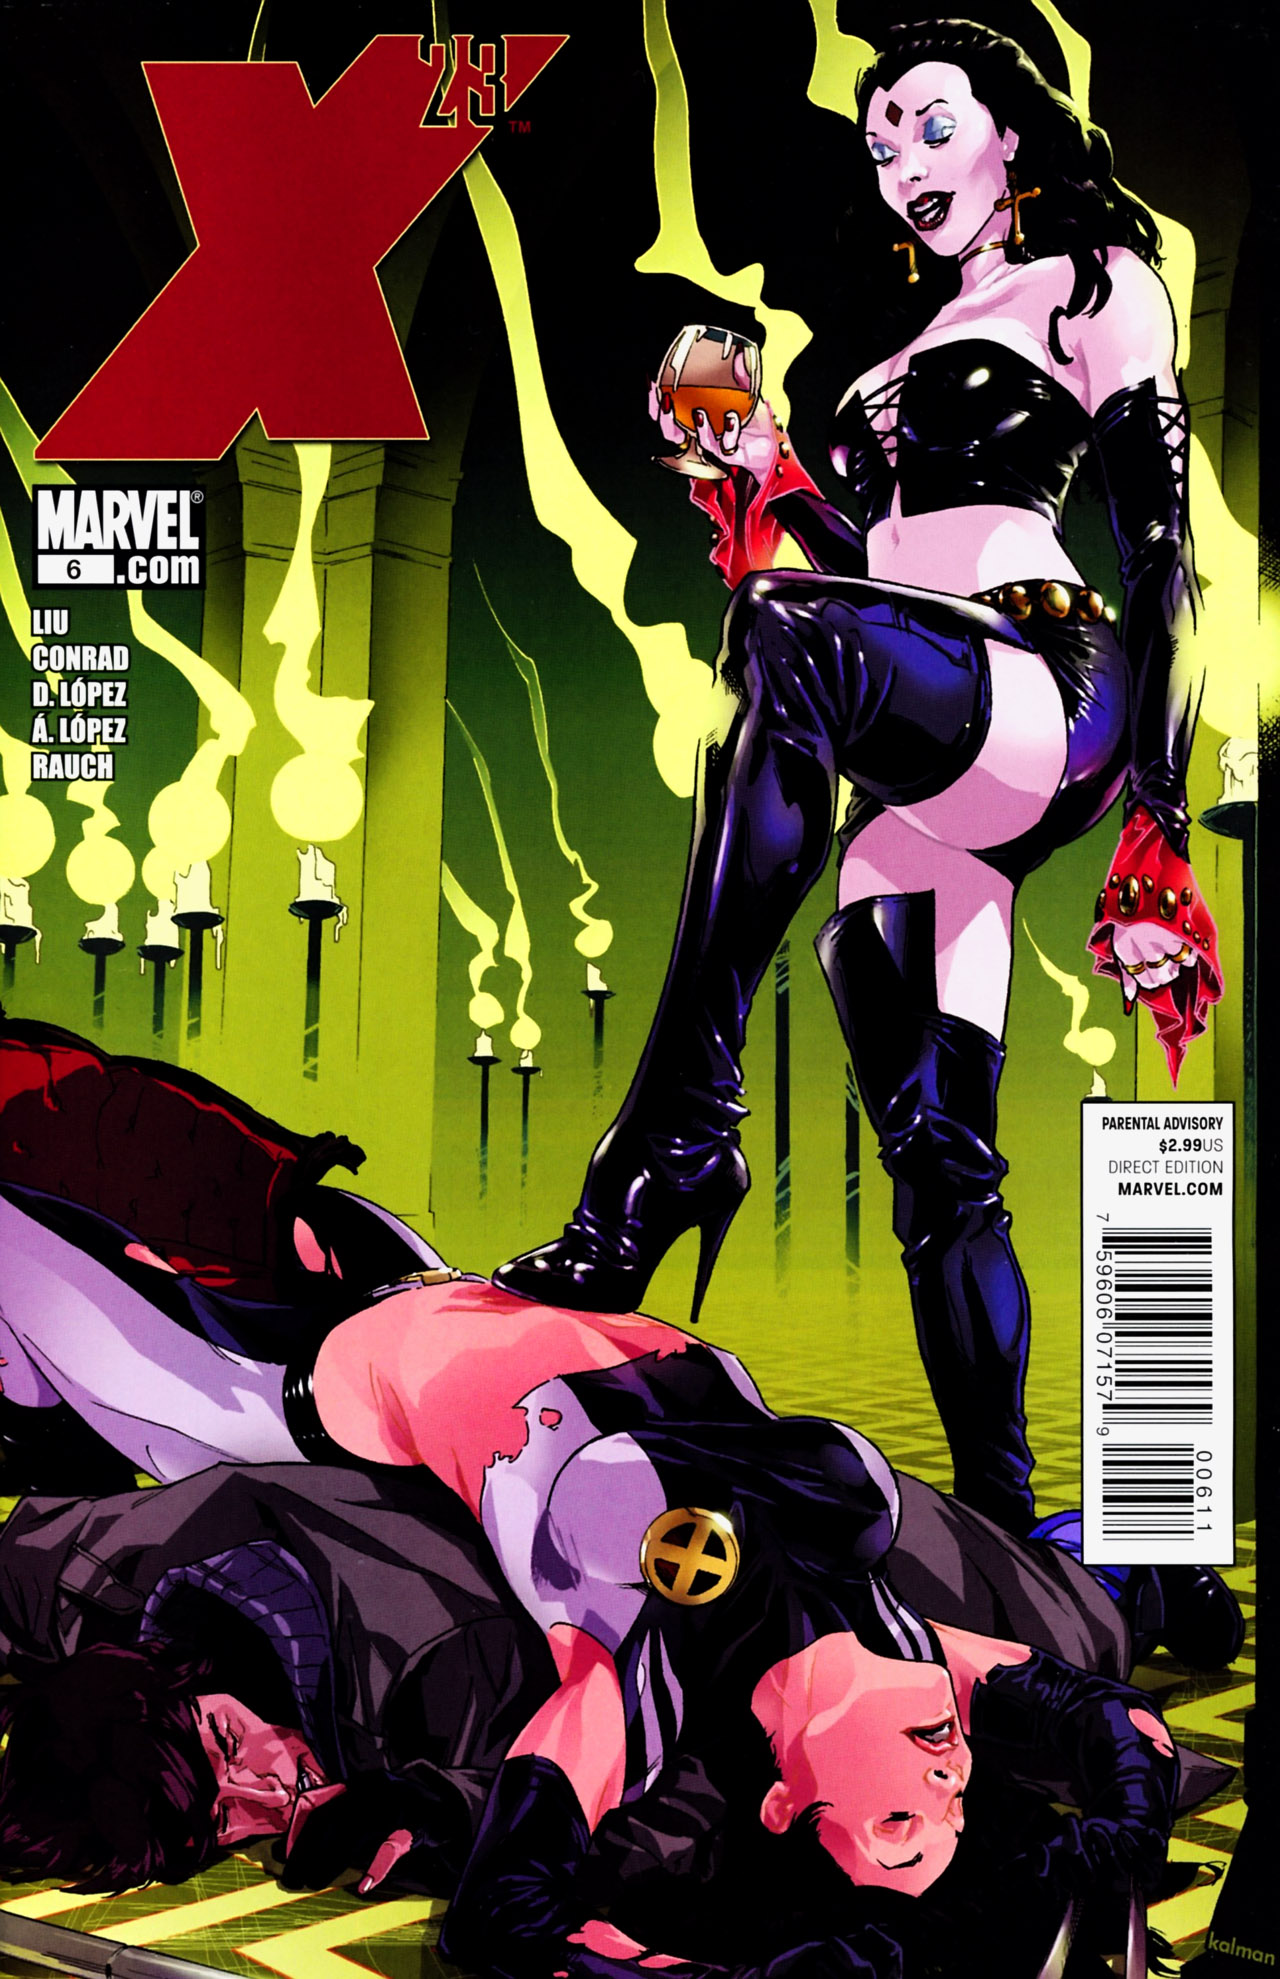 X 23 Marvel X-23 Vol 3 6 | ...